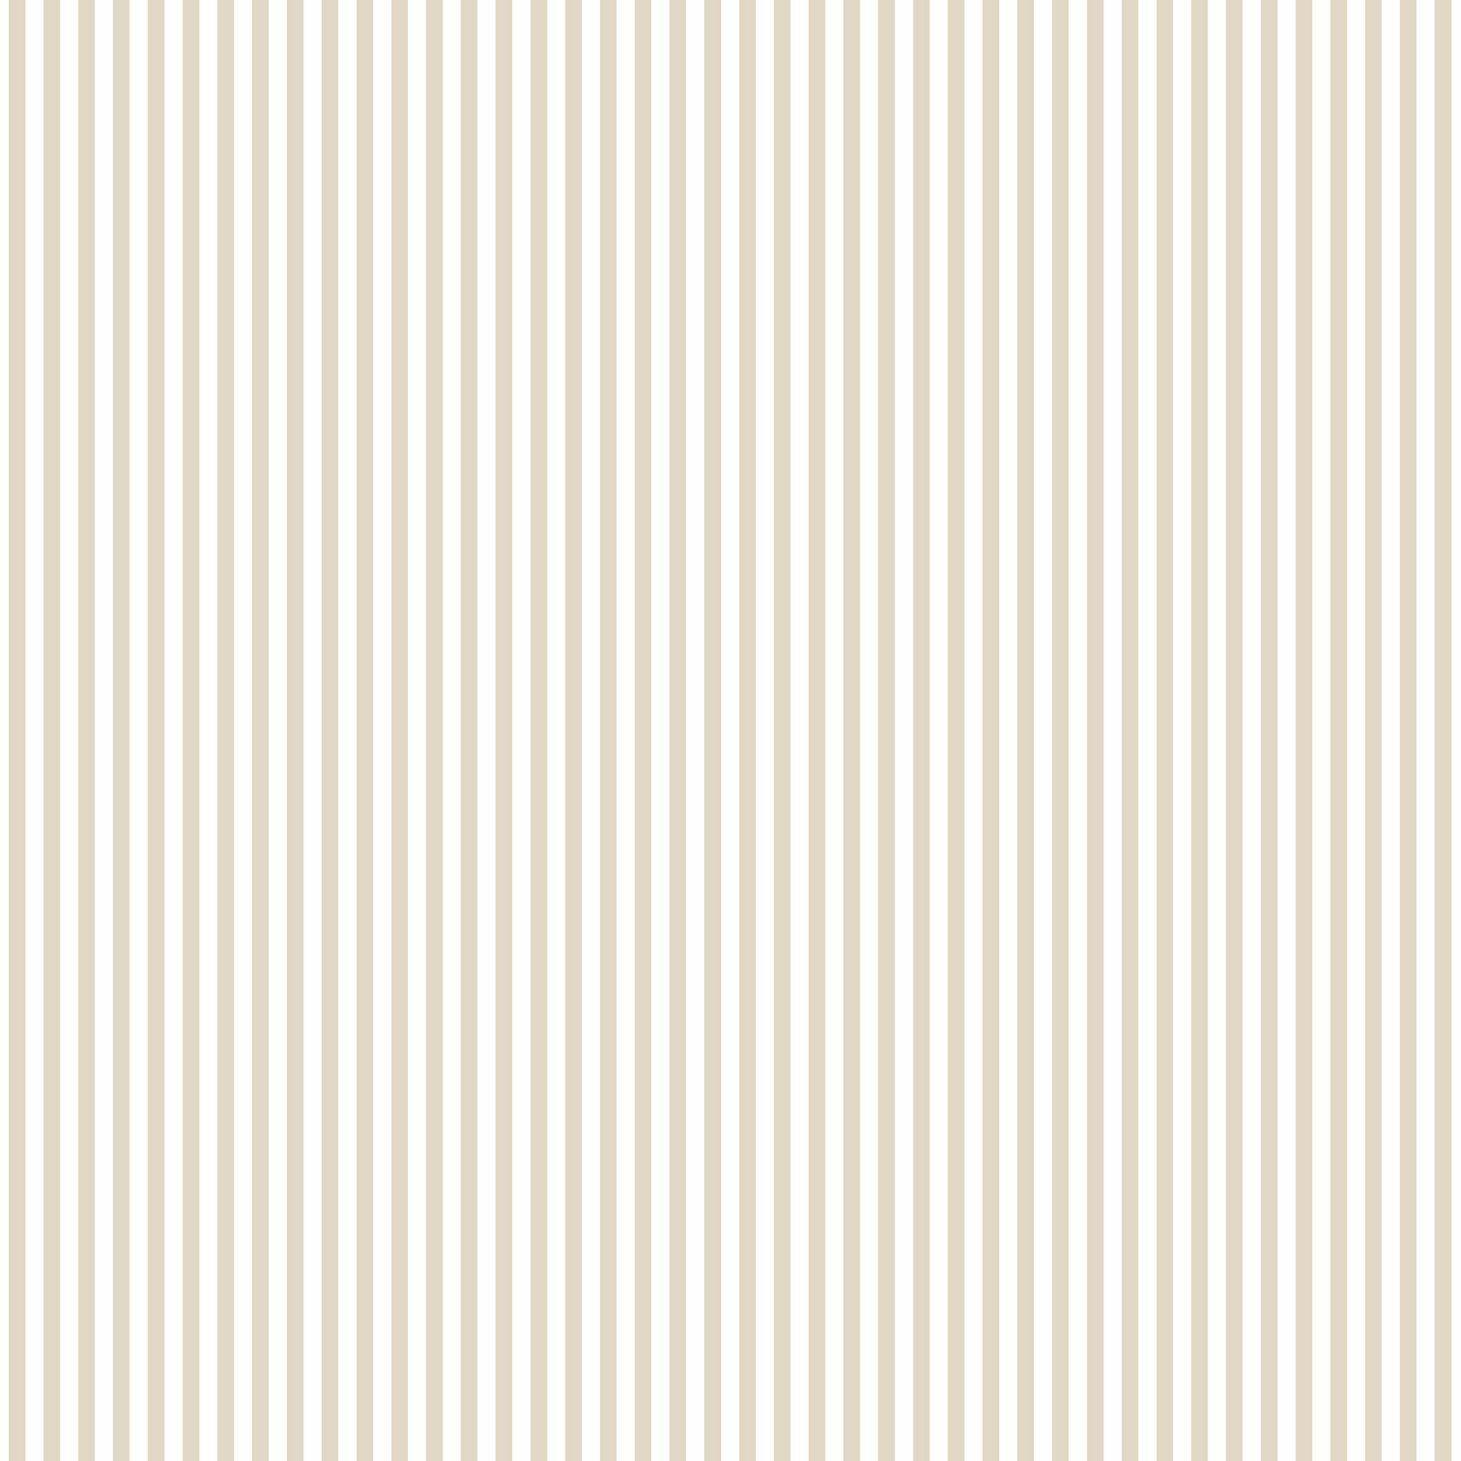 Essener Tapete Simply Stripes 3 Sy33960 Beige Stripes Striped Vinyl Wallpaper